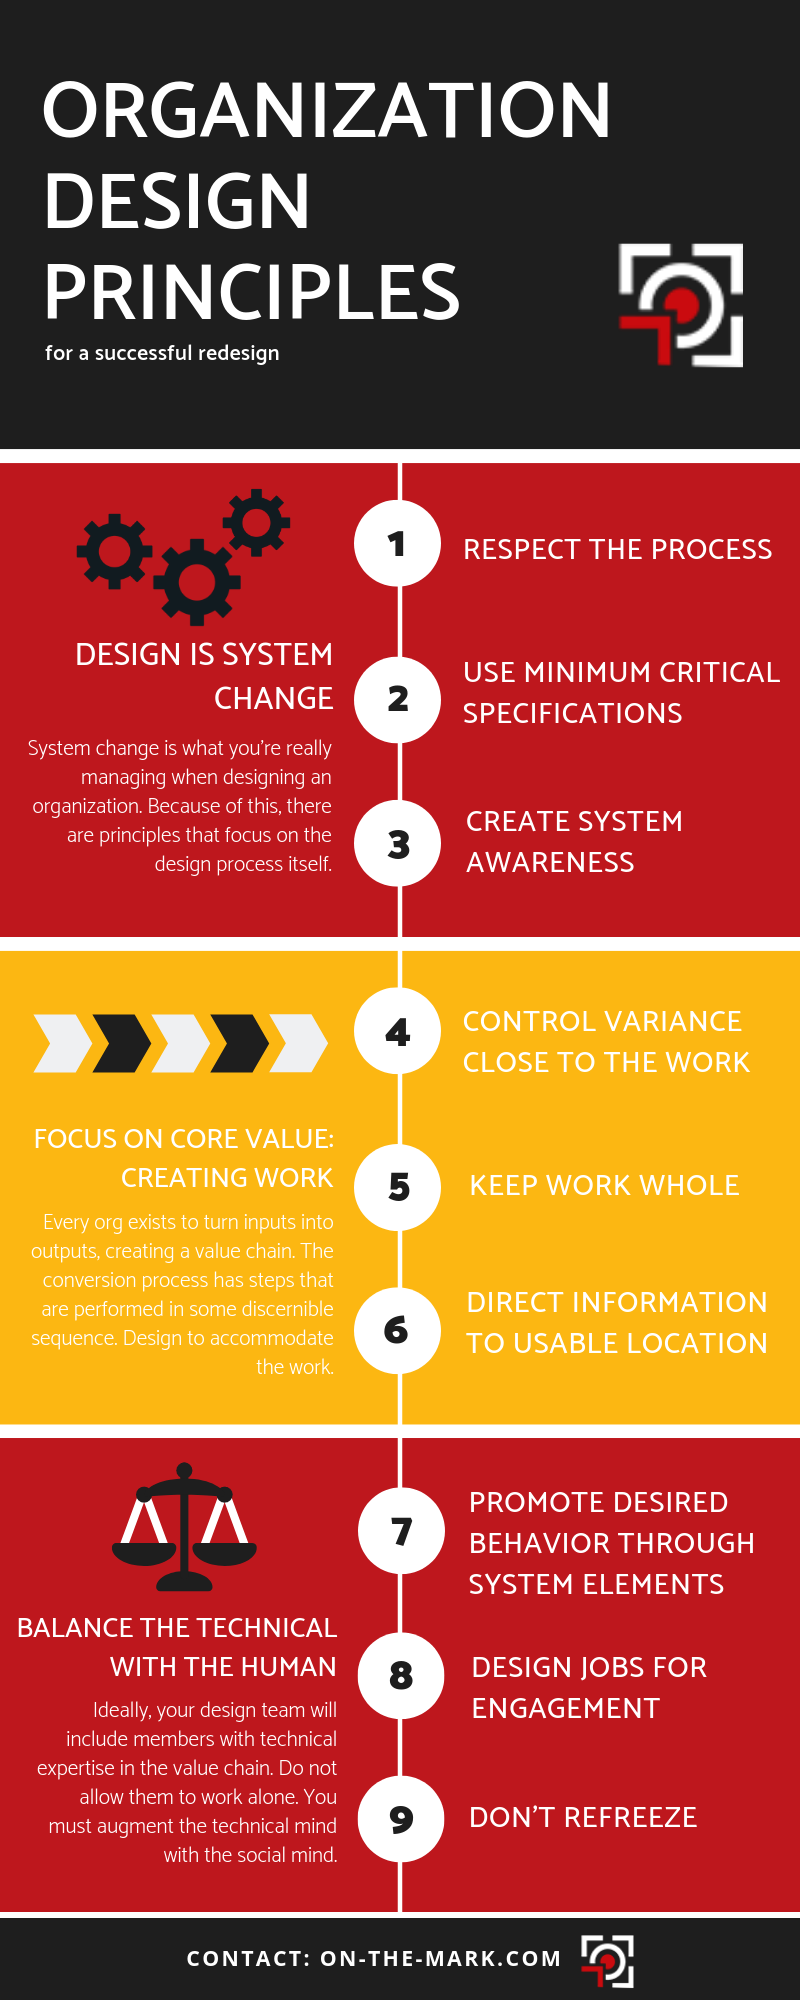 organization design principles infographic